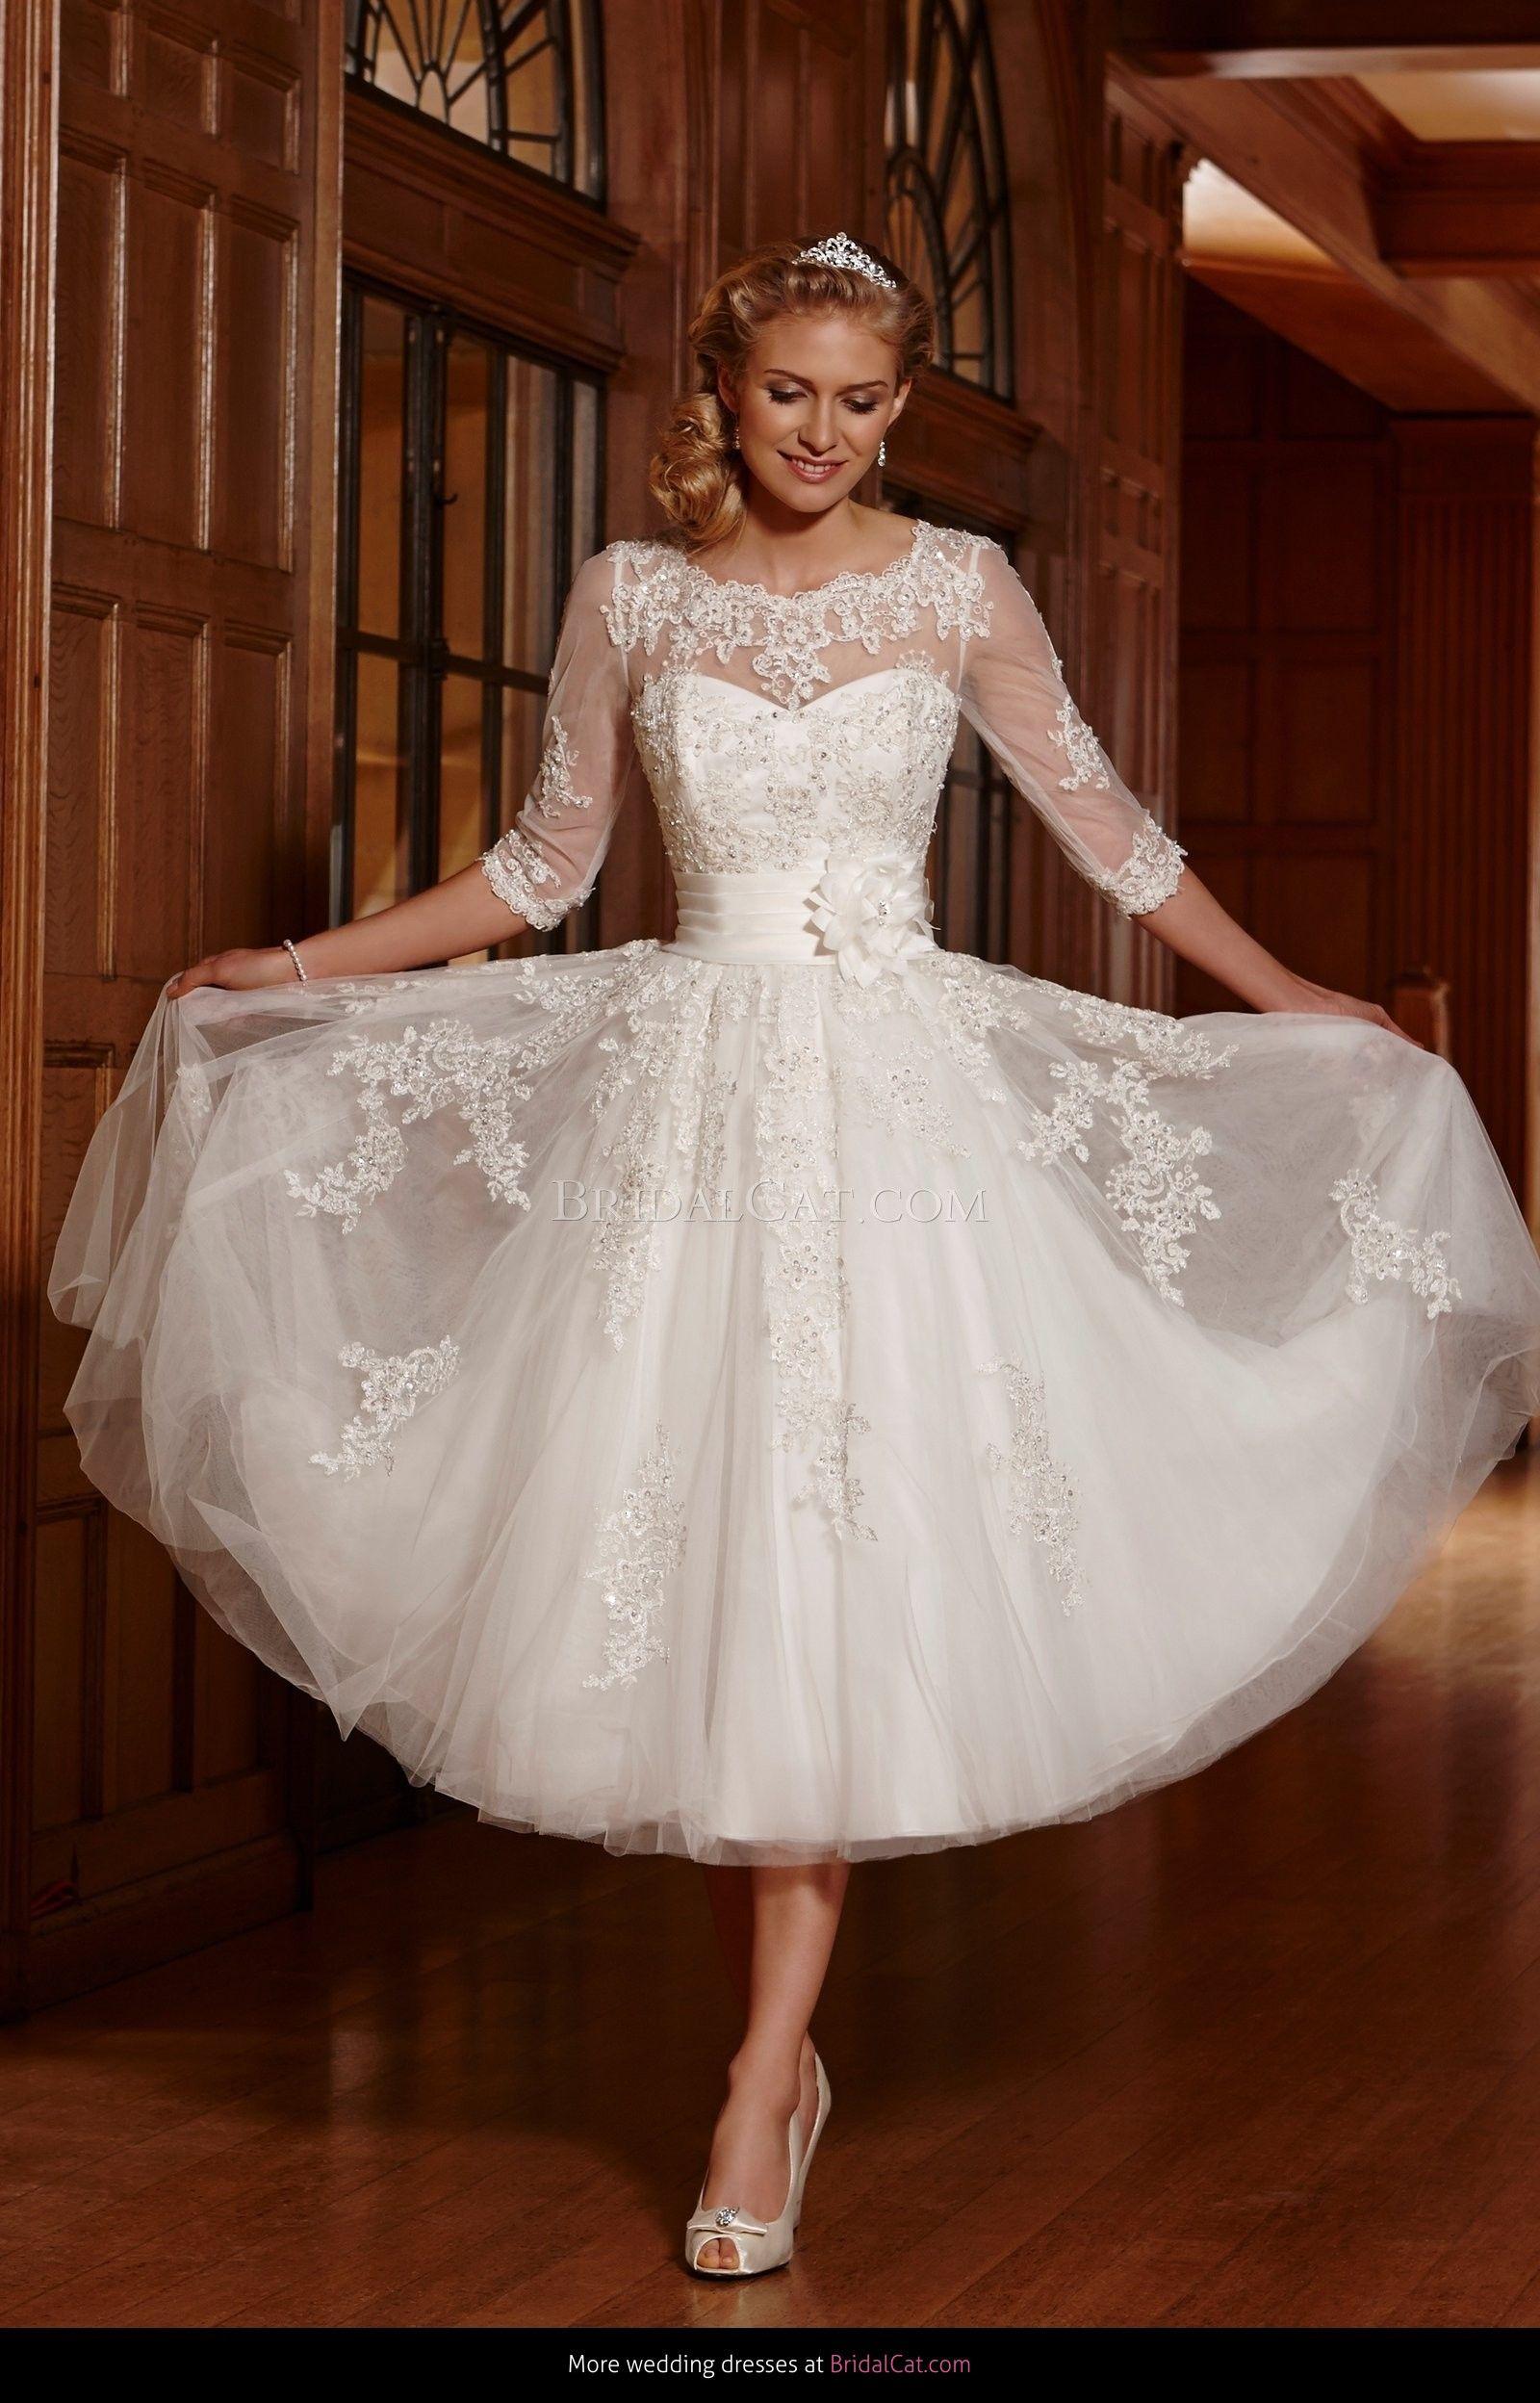 Knee length wedding dress  Under the knee wedding dresses  Bridal Studio  Pinterest  Wedding